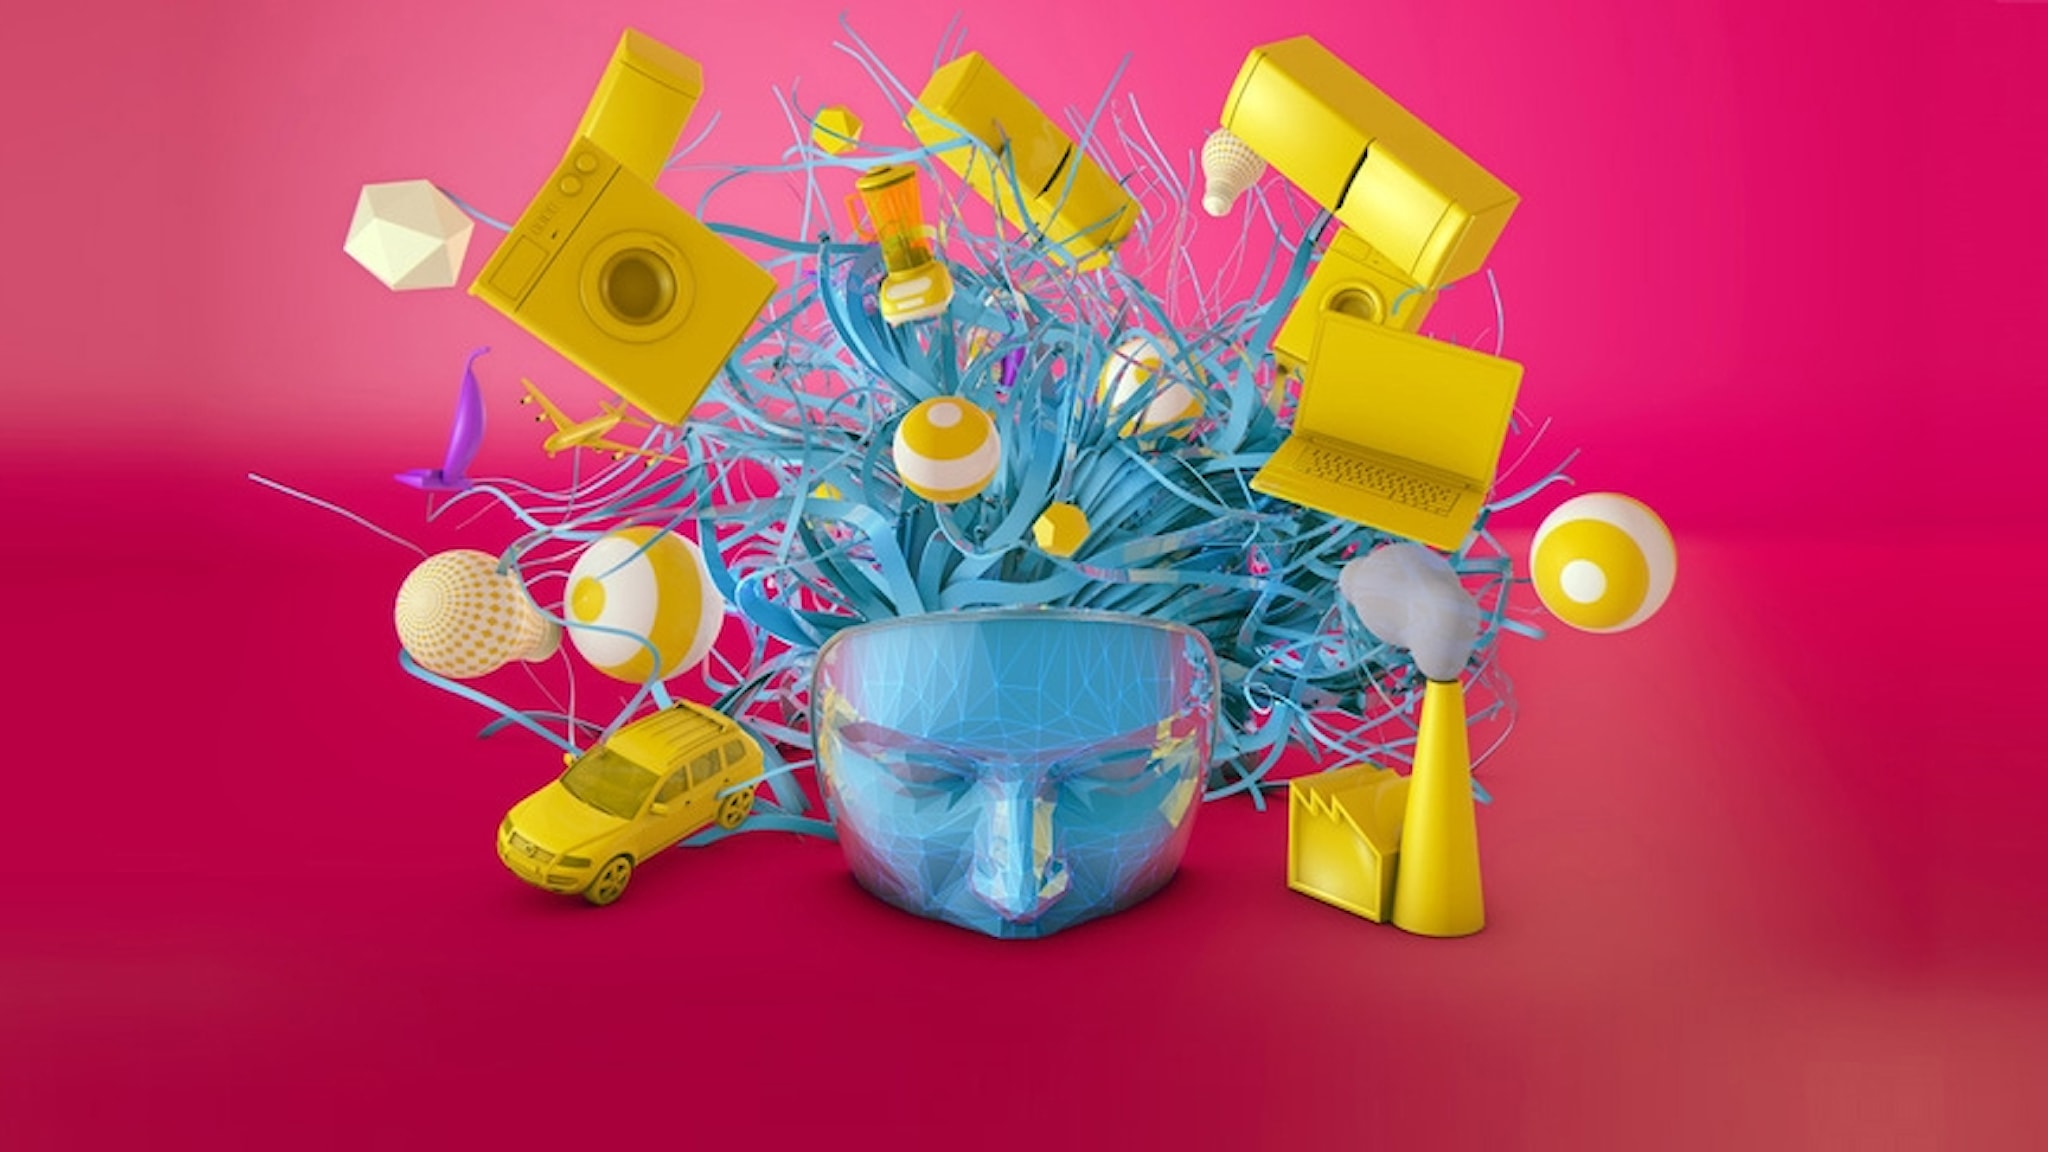 illustration av saker omkring ett huvud